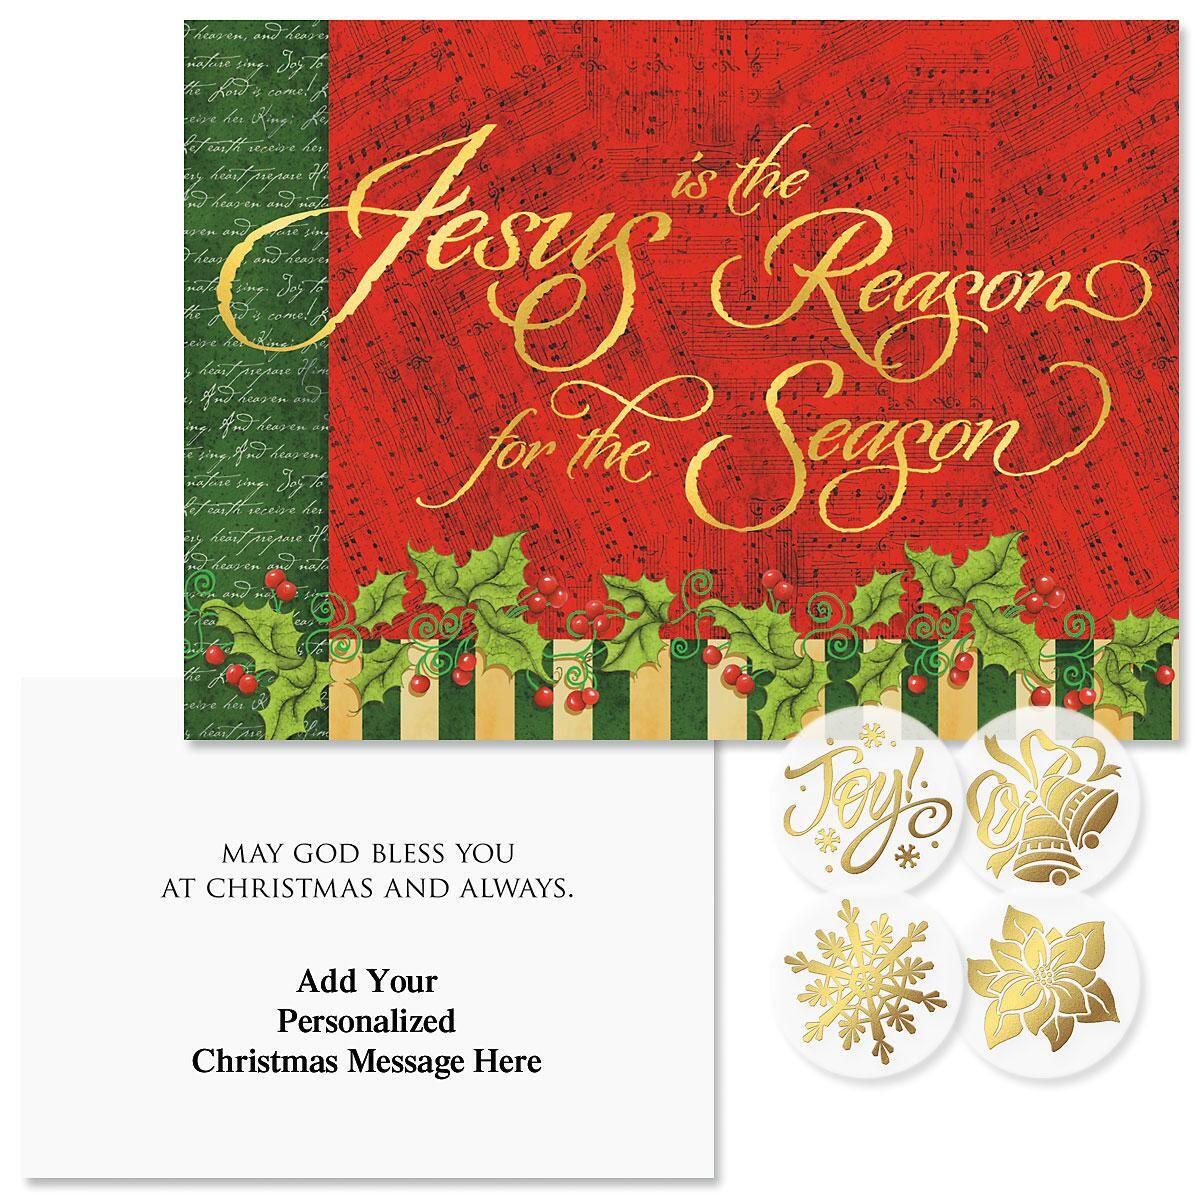 Joyful Season Christmas Cards Colorful Images